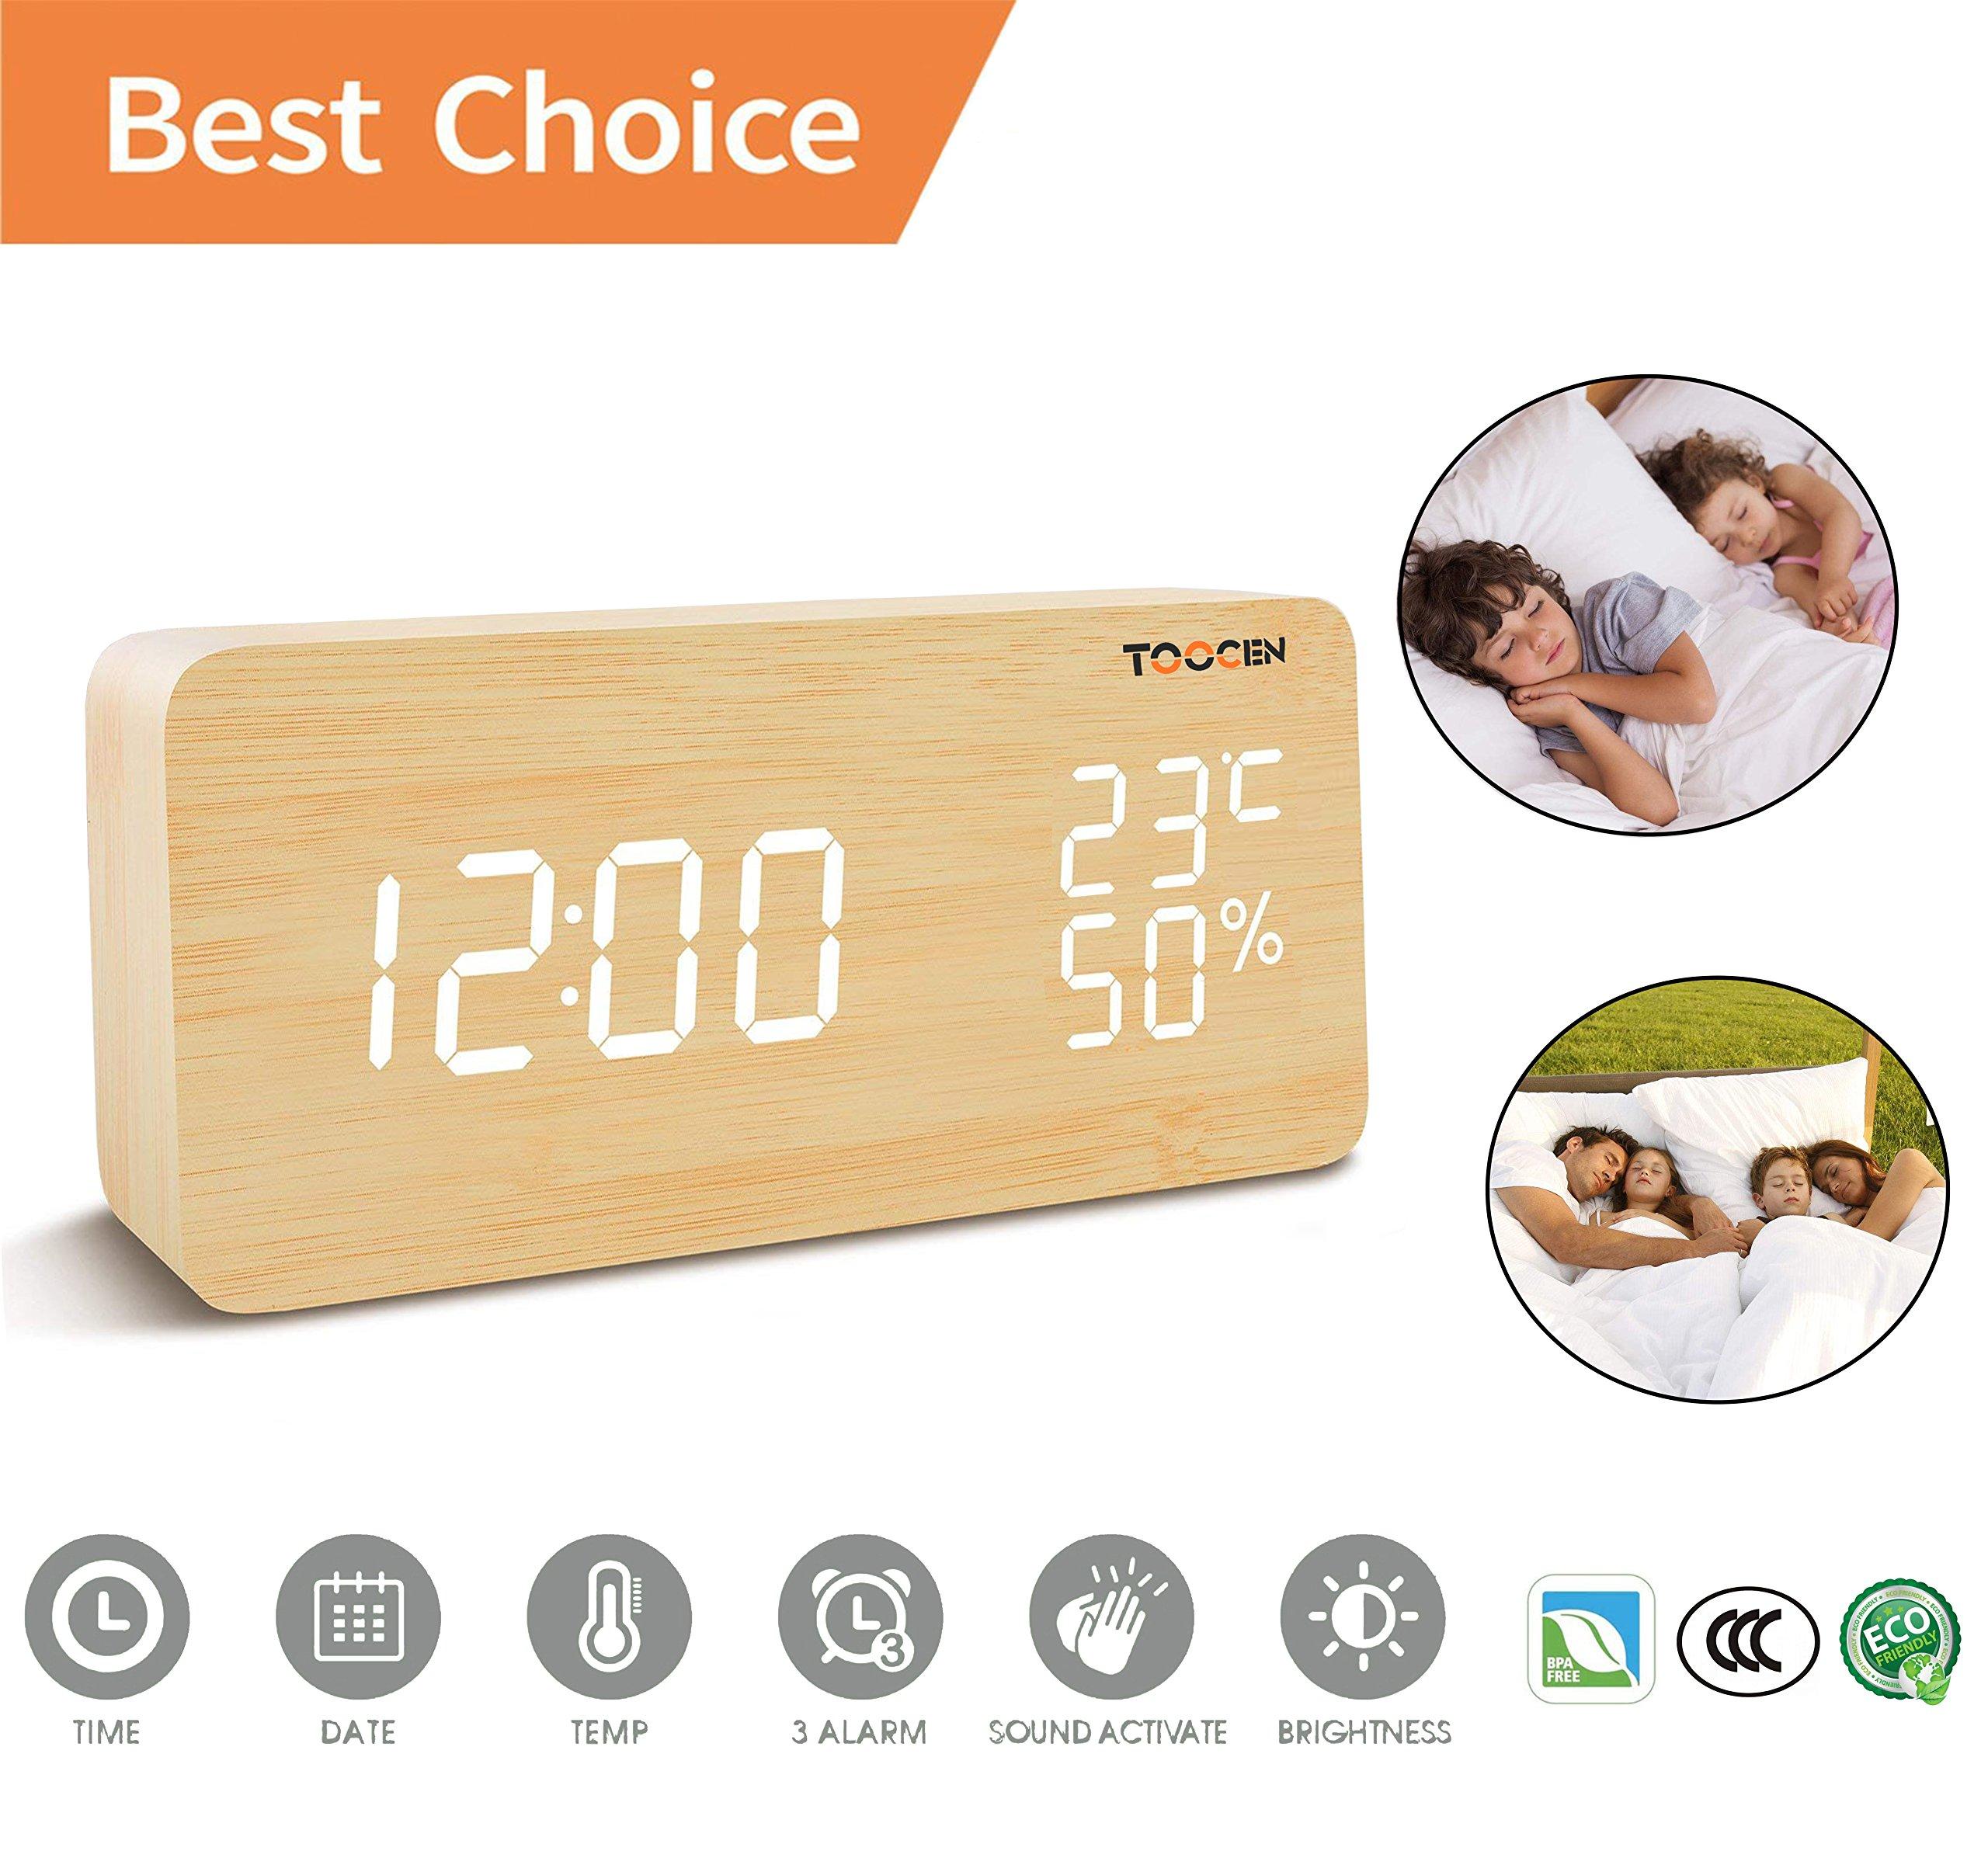 Alarm clock-Wood LED Digital Smart Alarm Clock - Voice Control Digital Alarm Clock - 3 Alarm Groups - 3 Brightness Levels - Display Time, Temperature, Humidity - Suitable For Home, Livingroom, Bedroom